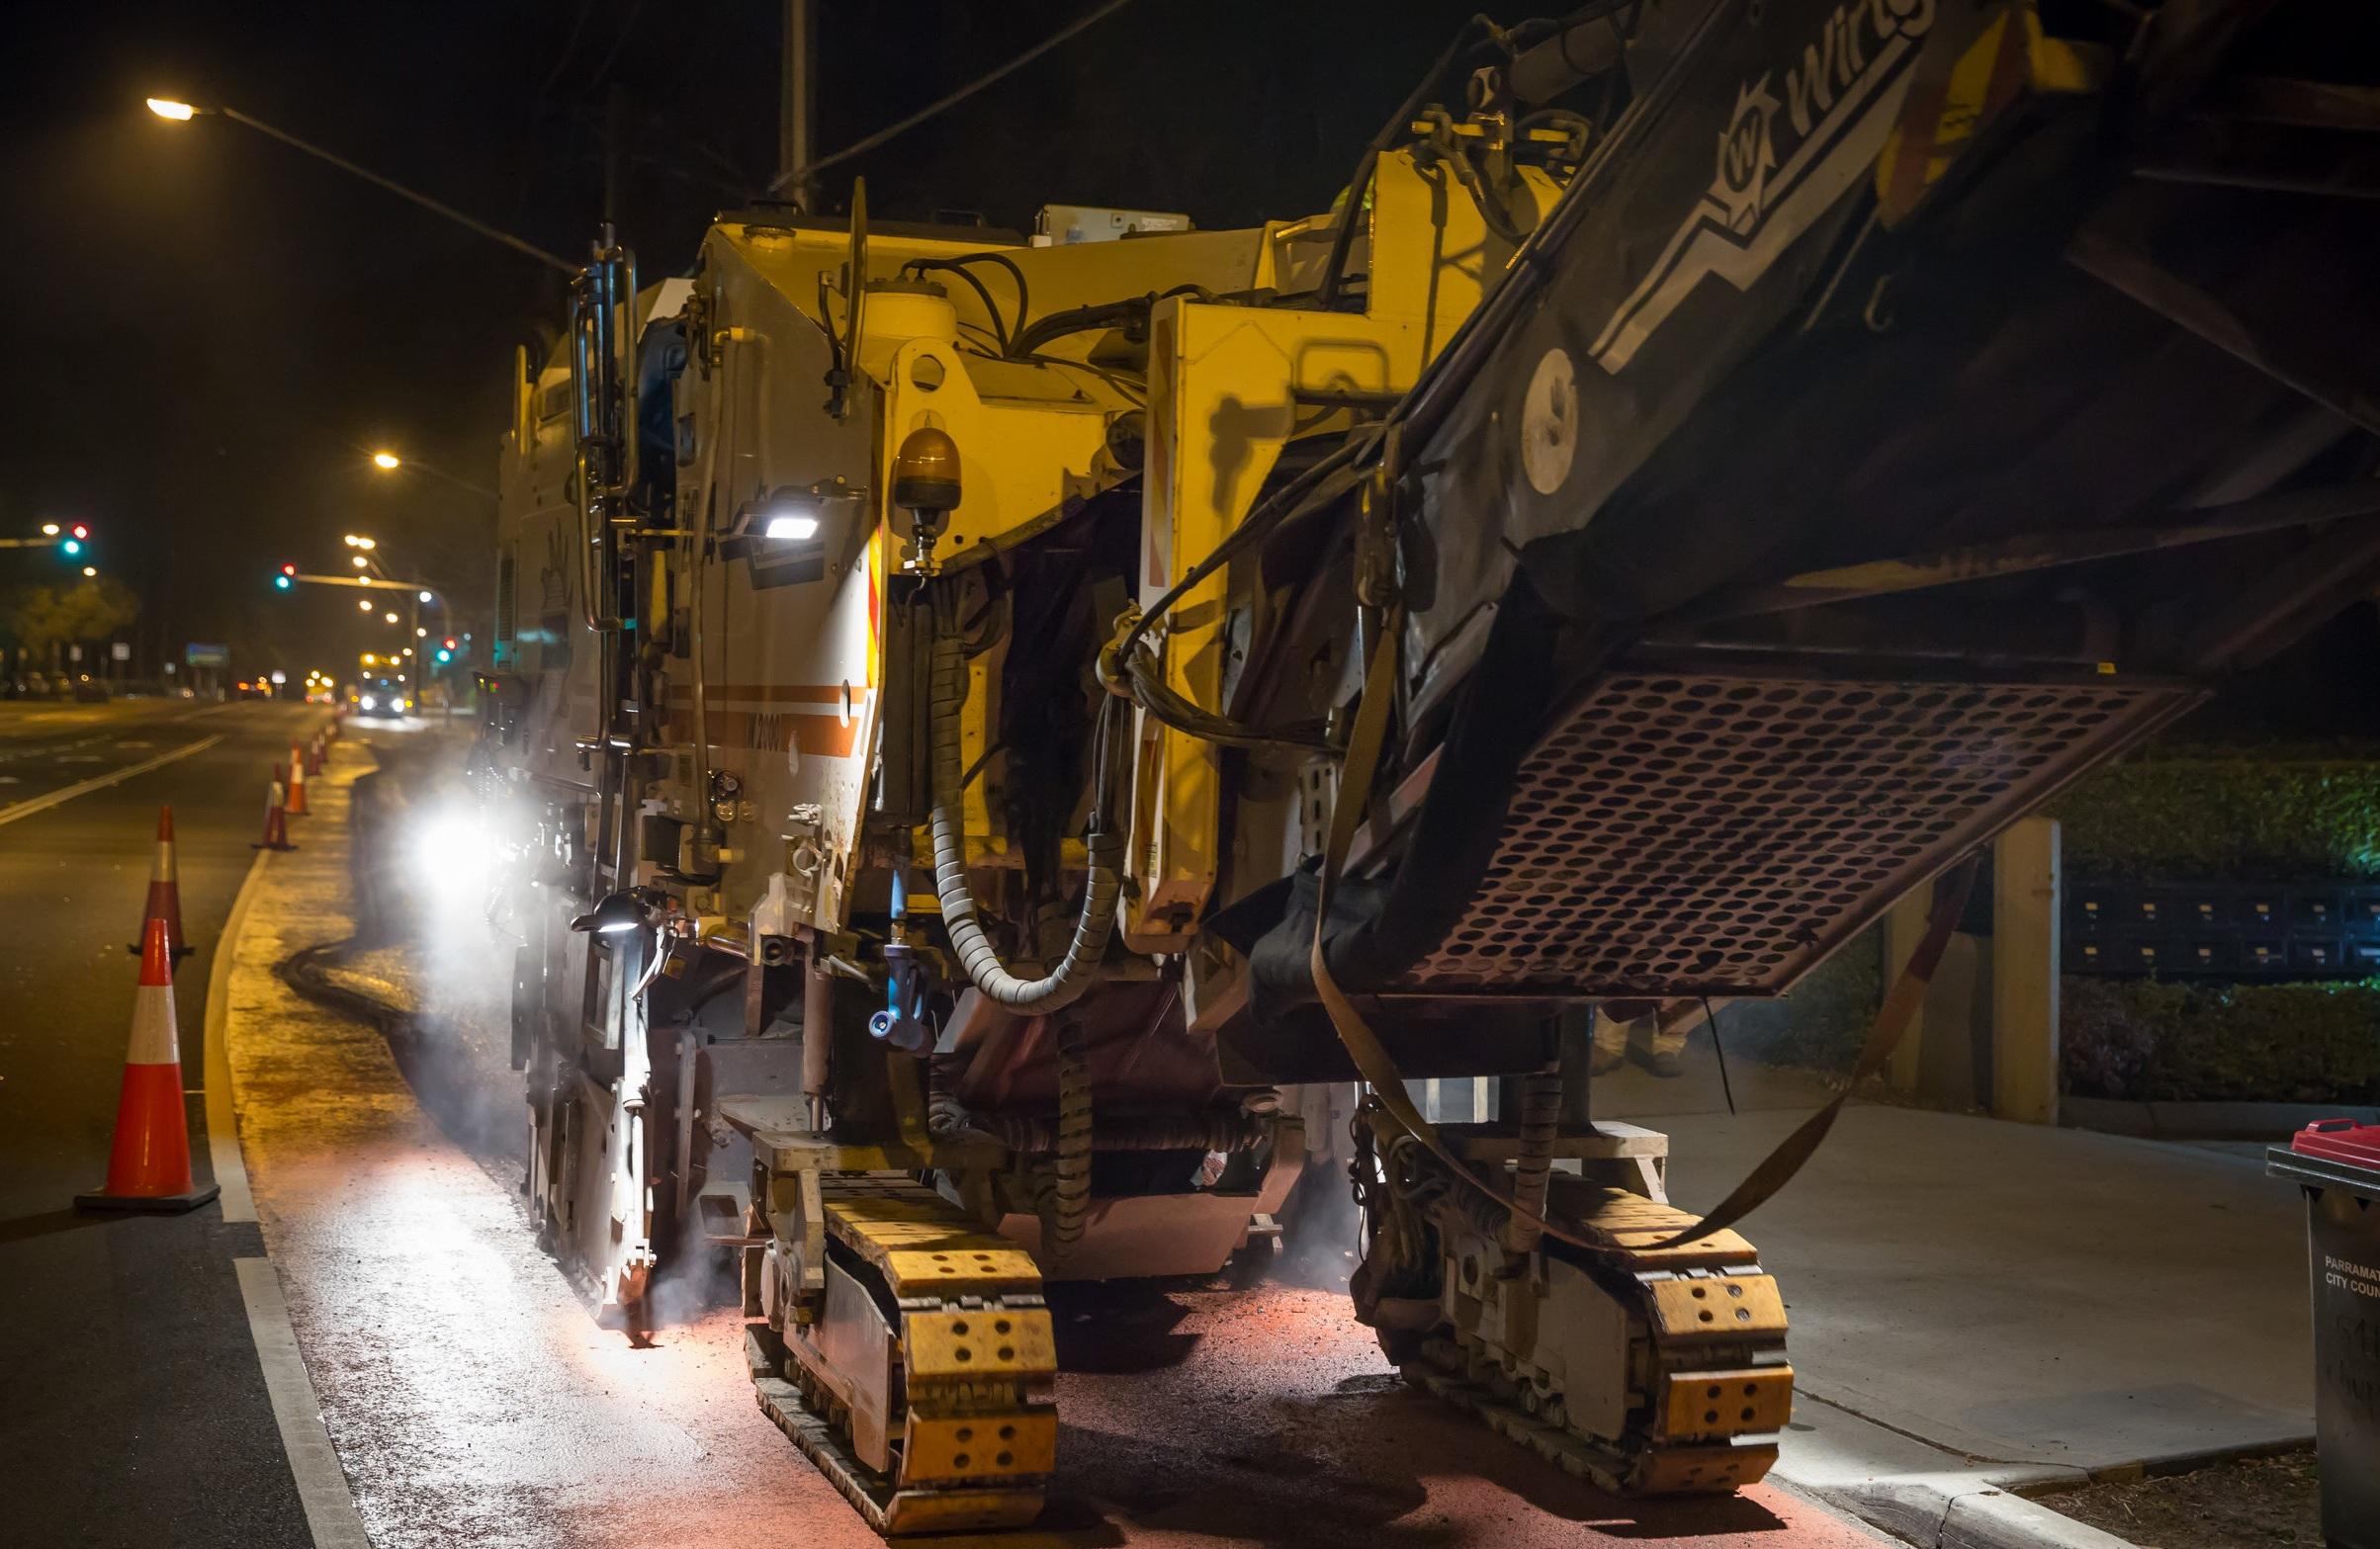 sd-group-parramatta-bus-lane-resurfacing-project